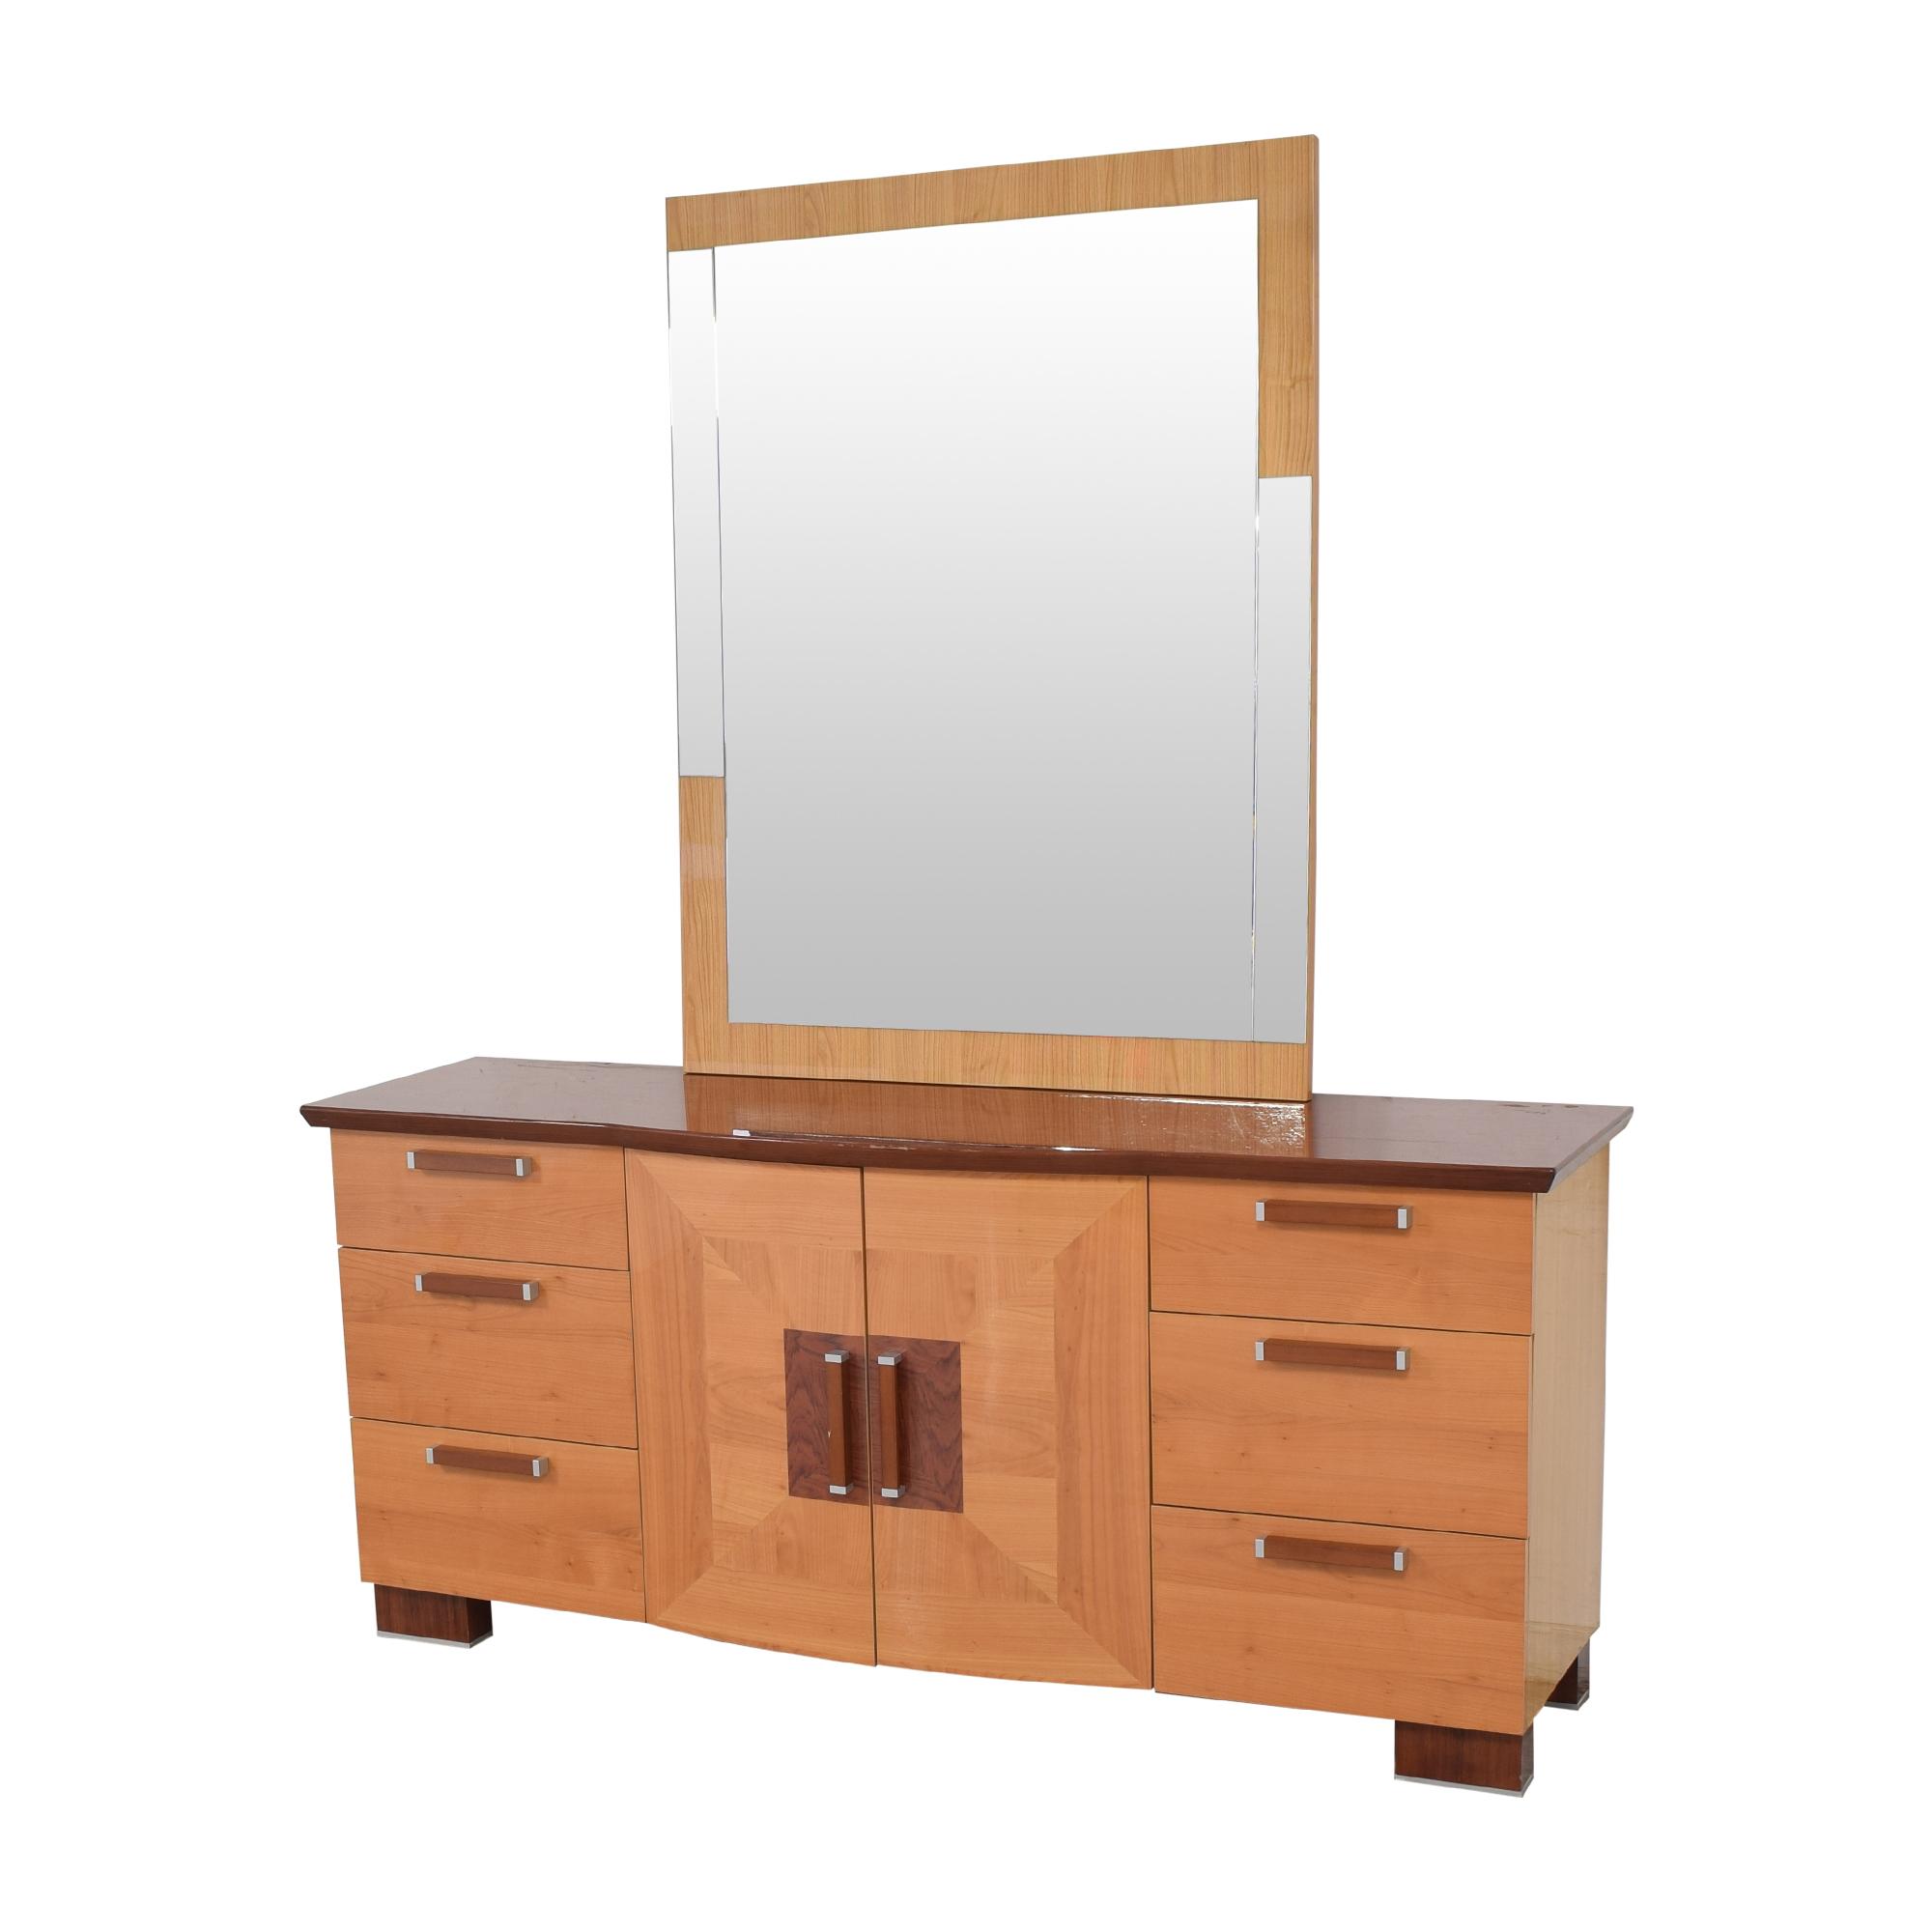 Alf Italia Alf Italia Door Dresser with Mirror on sale